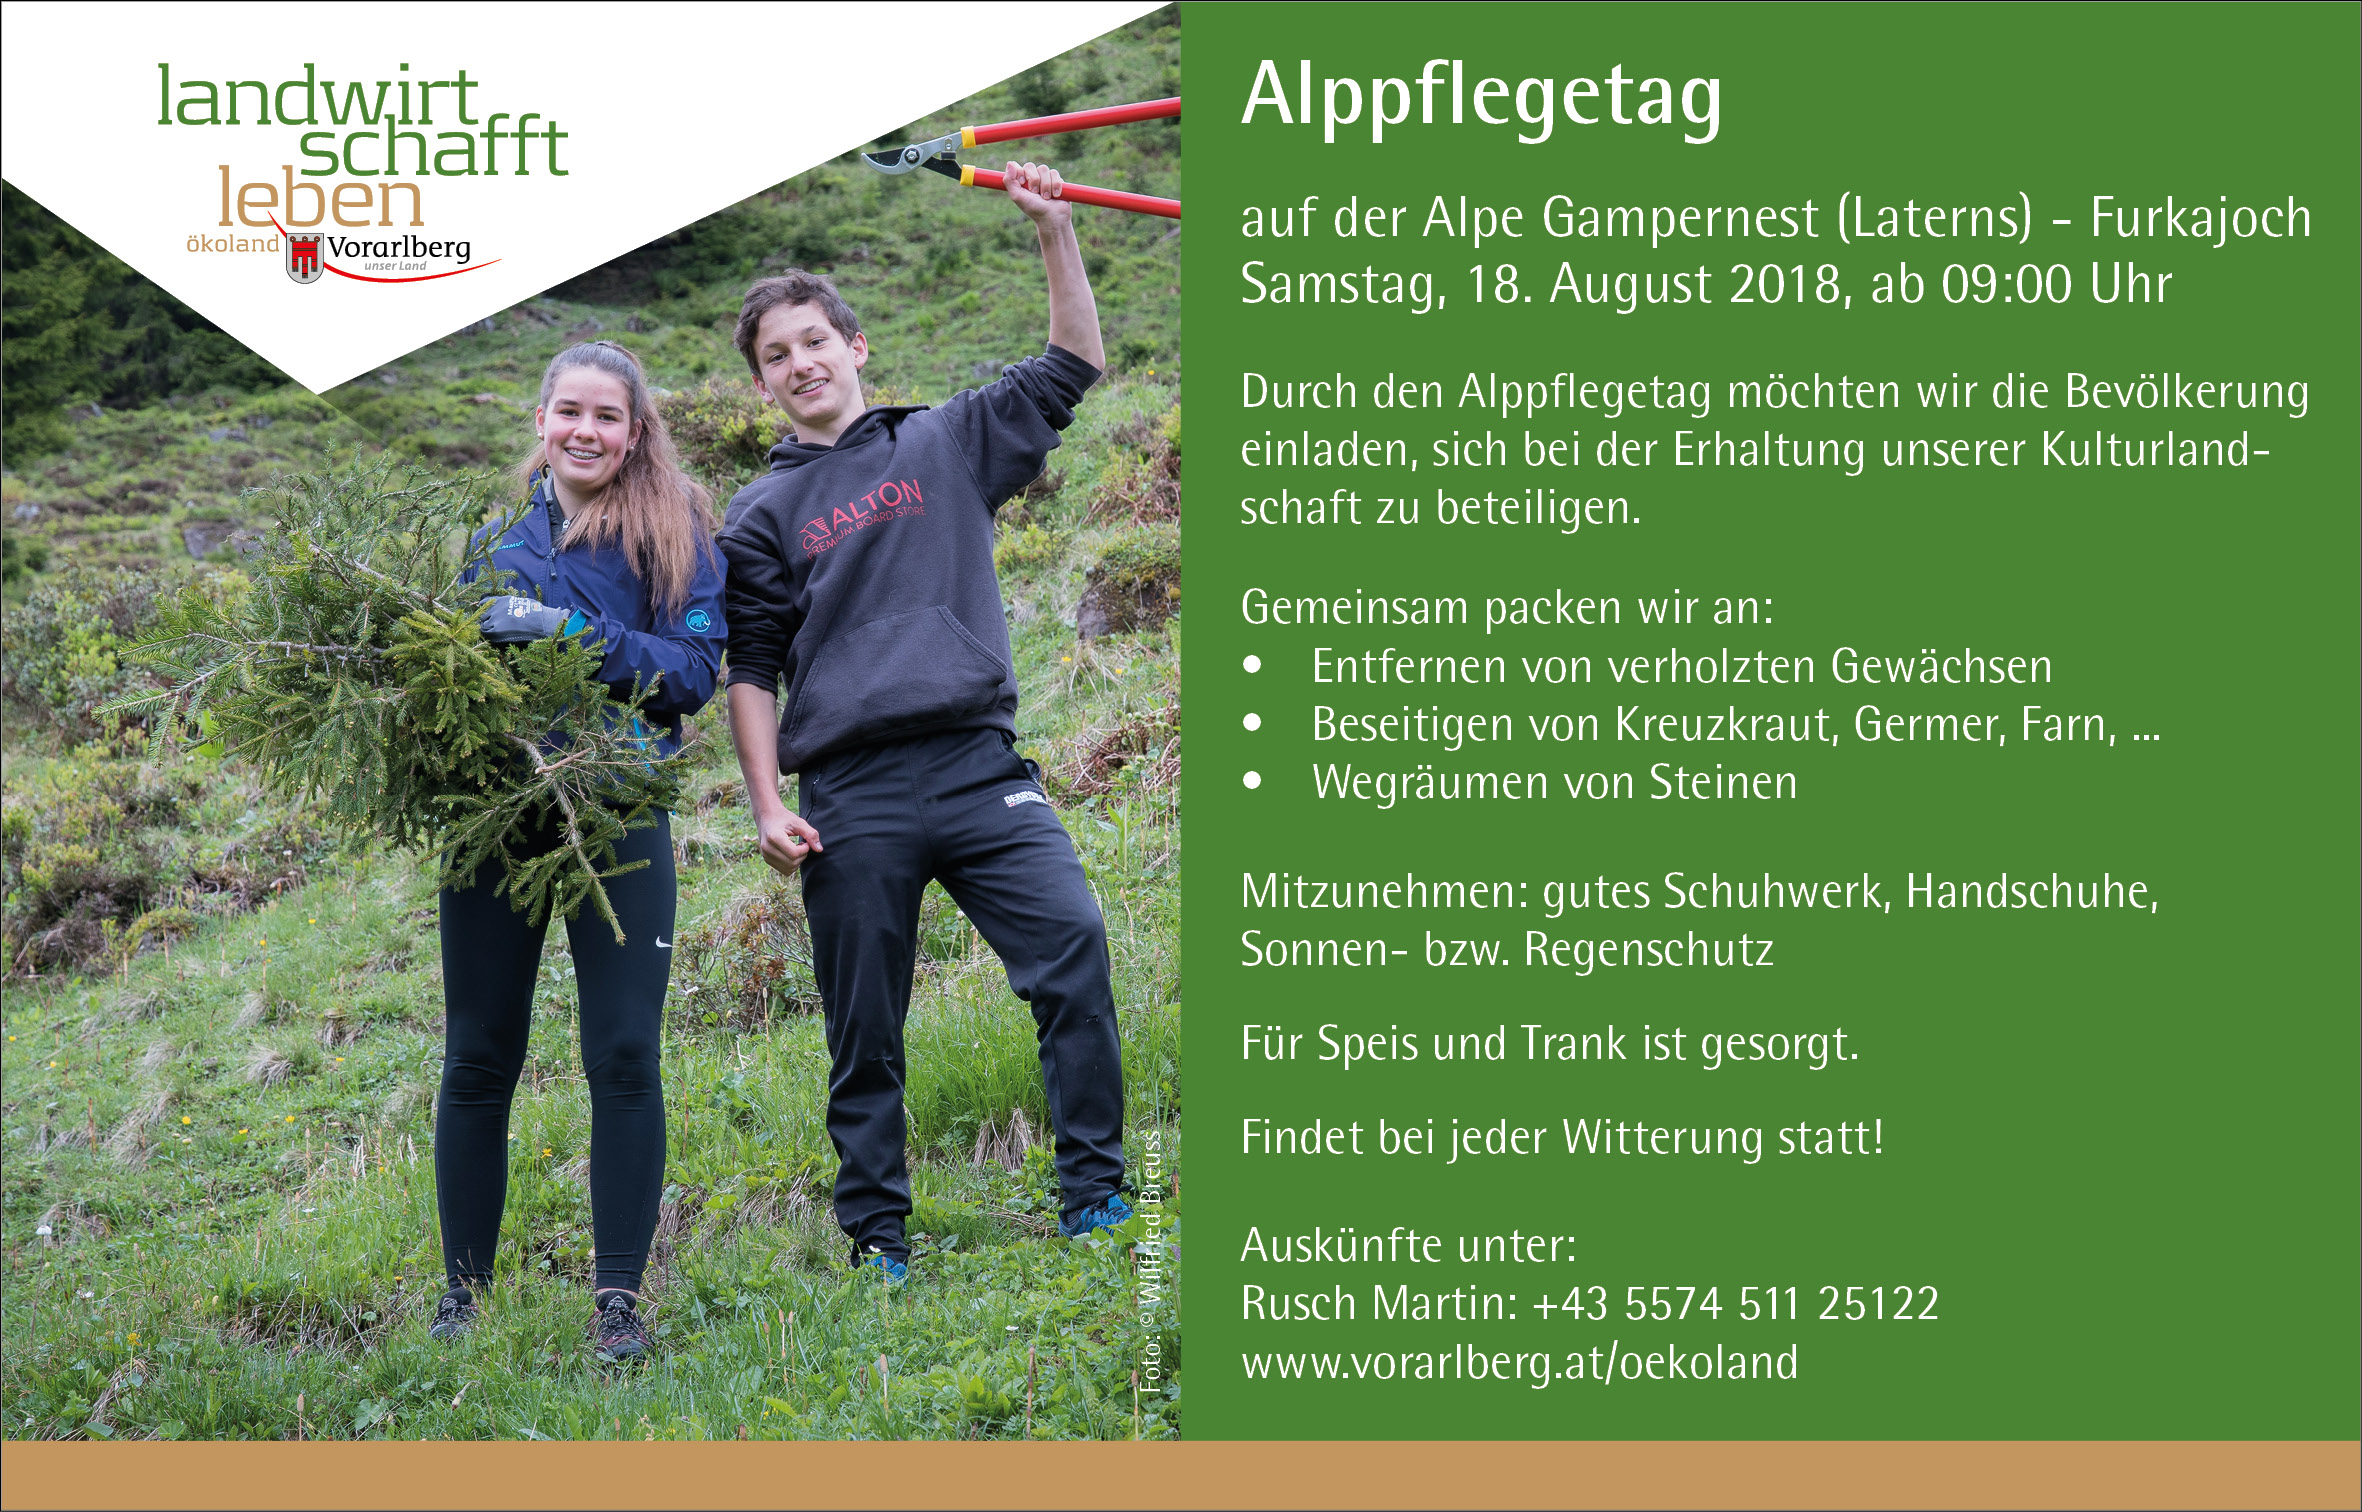 Alppflegetag_Gampernest-2018.08.18.jpg